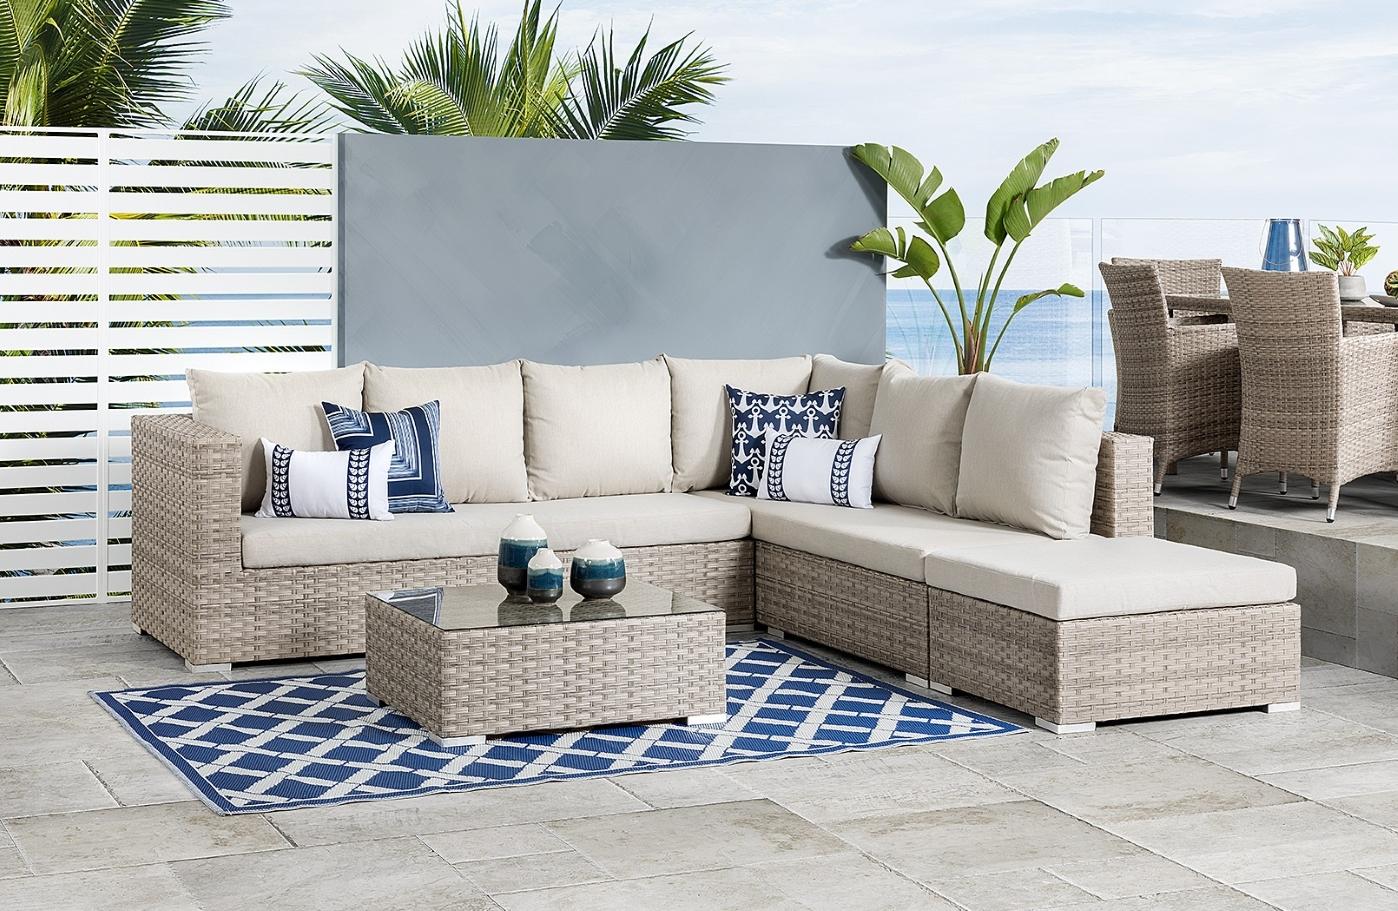 Image of luxurious simple ratton garden furnitures.